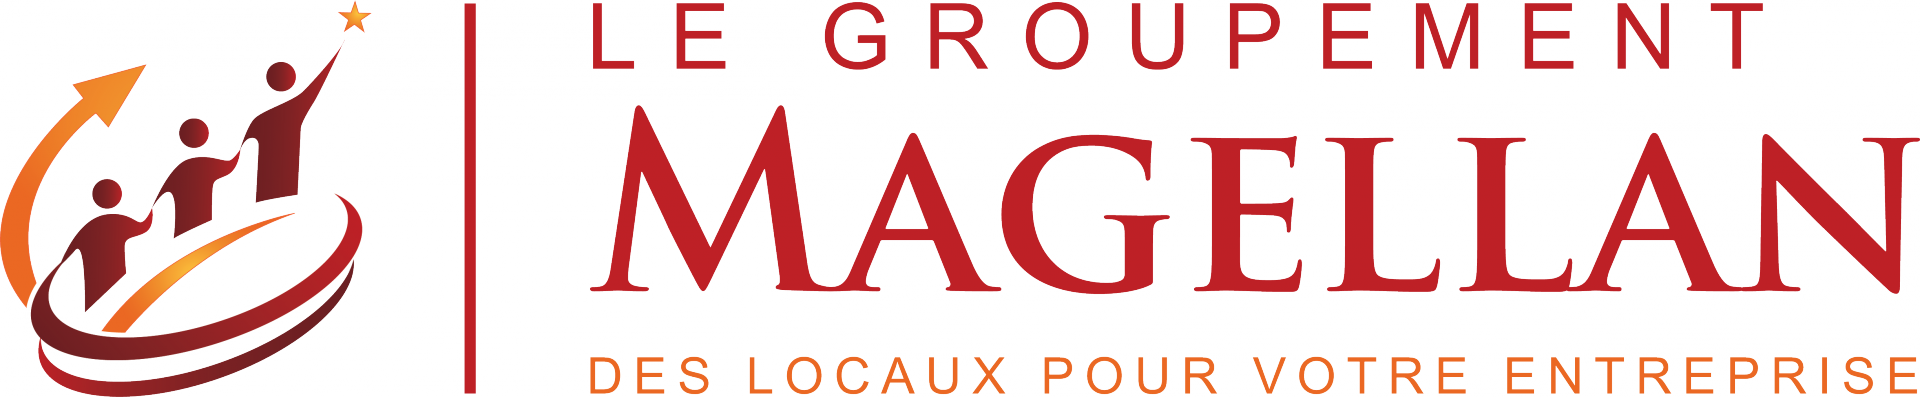 Logo Magellan Premium